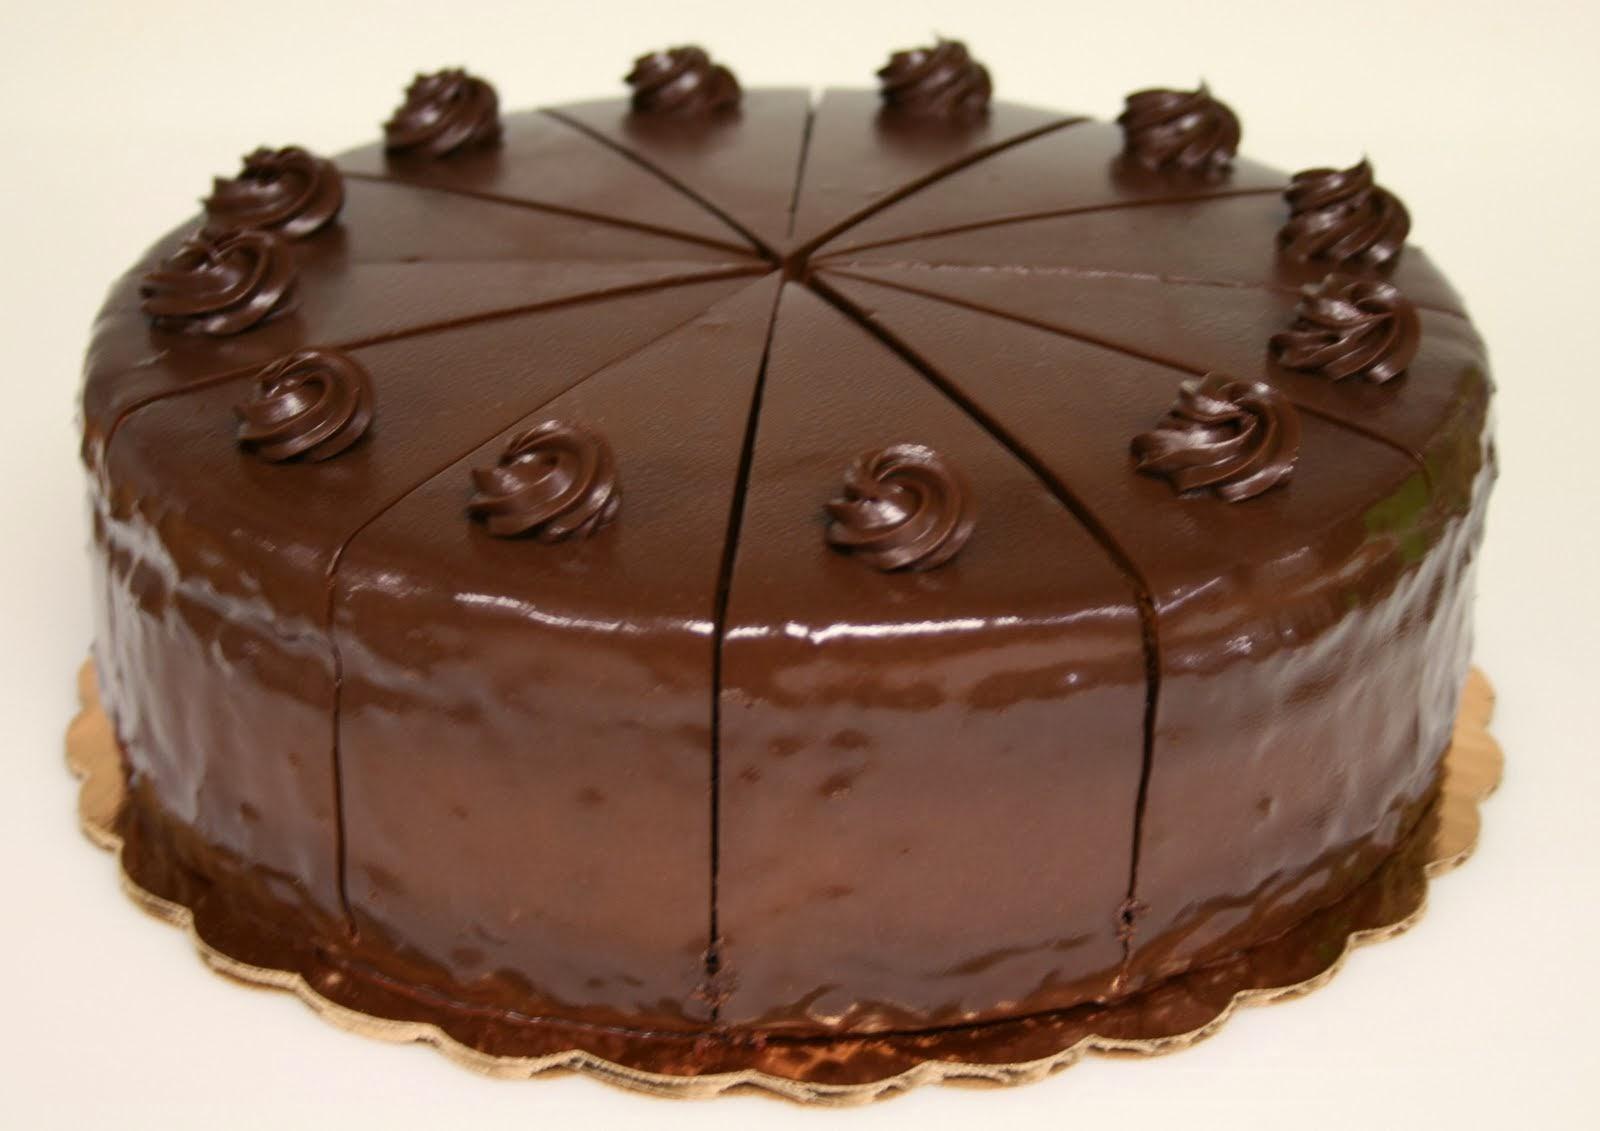 Sri Lankan Tasty Recipes Chocolate Cake